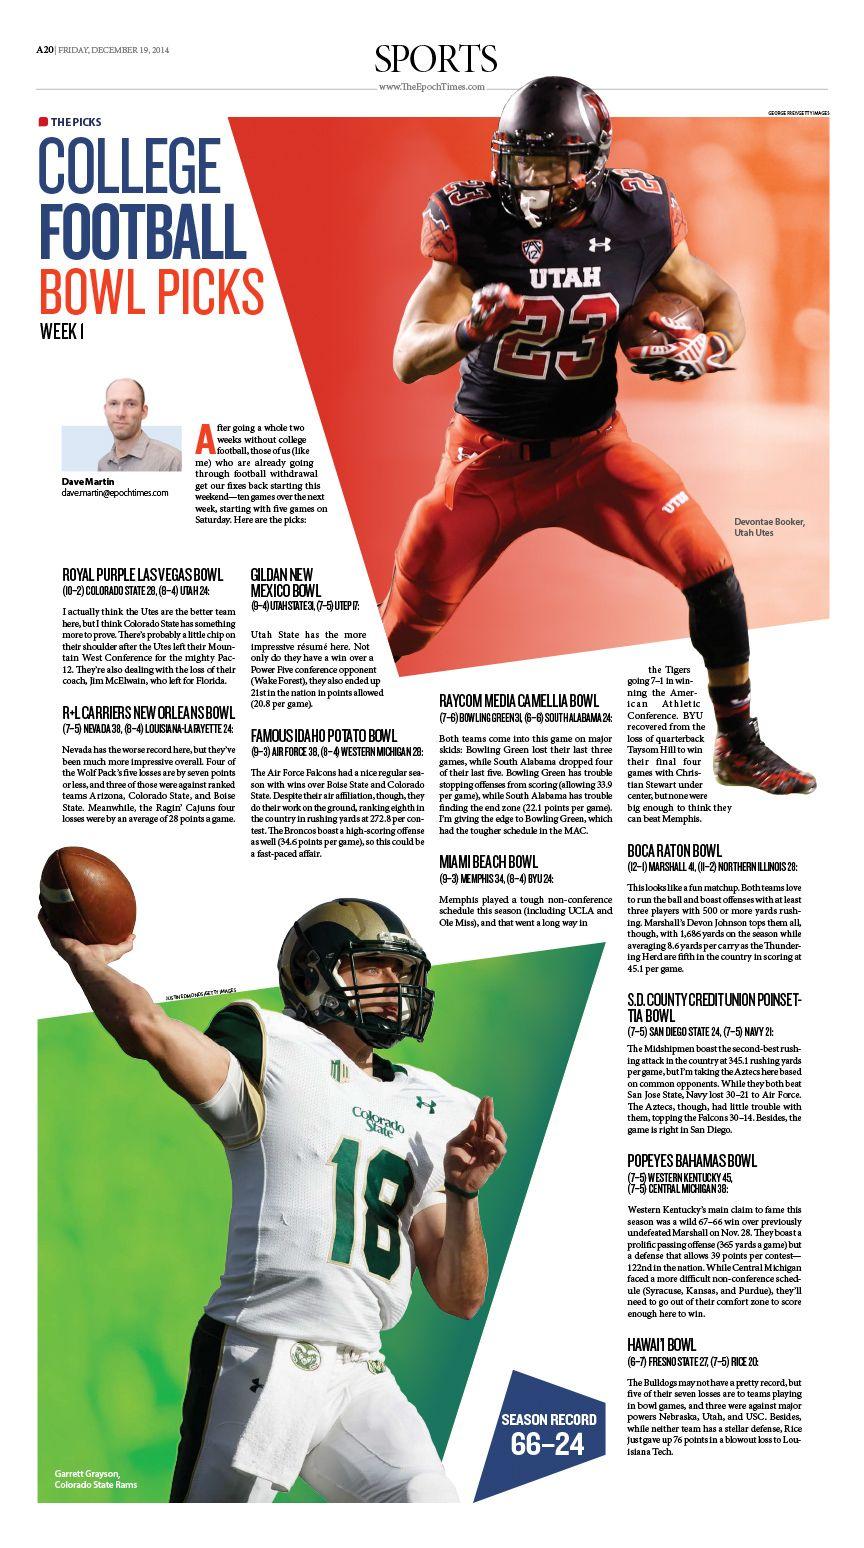 College Football Bowl Picks |Epoch Times newspaper